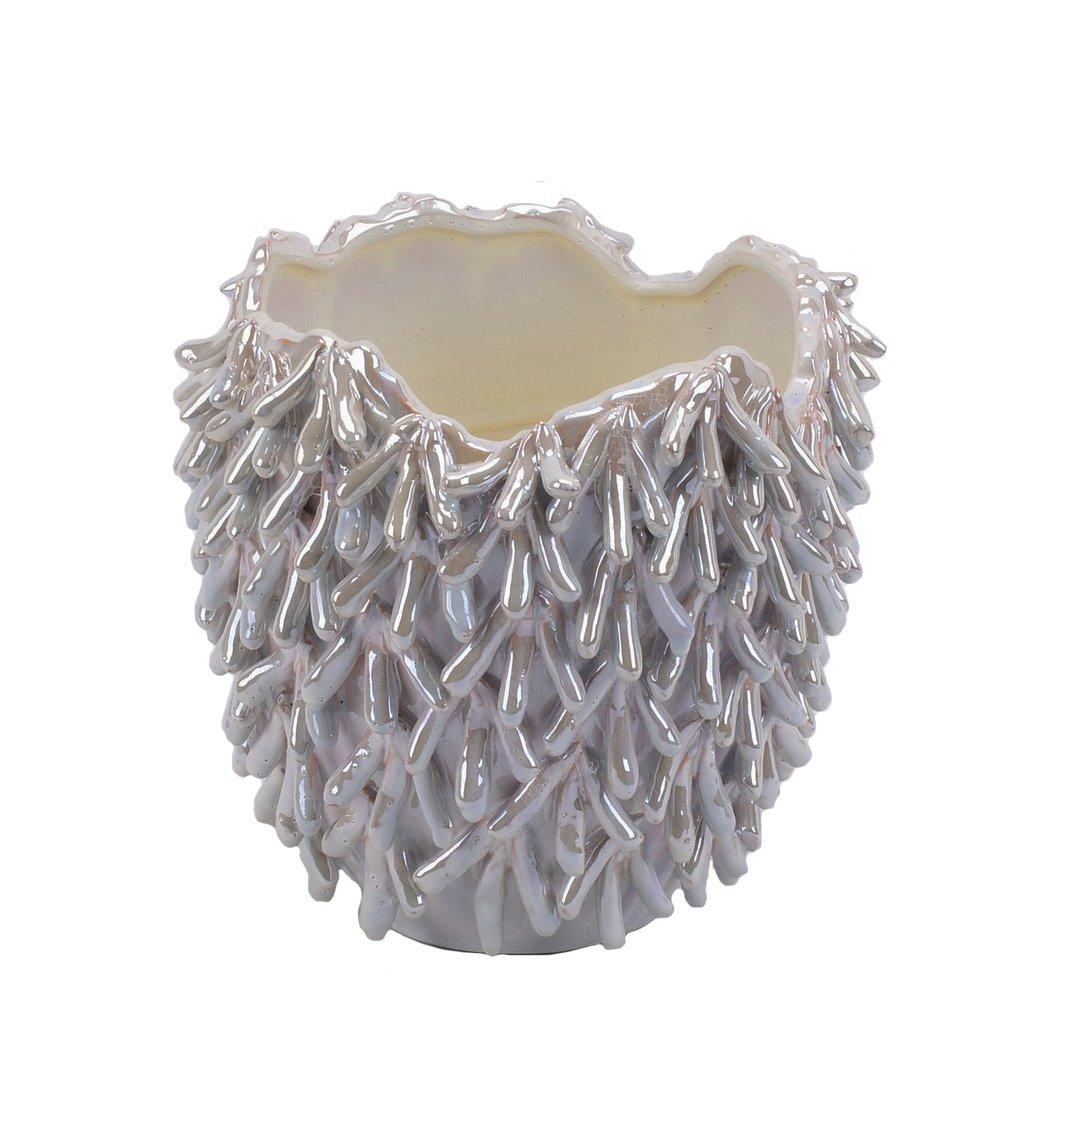 Sagebrook Home 10636 Decorative Ceramic Sea Urchin Vase 7.25 x 7.25 x 9.5 Inches Beige Ceramic